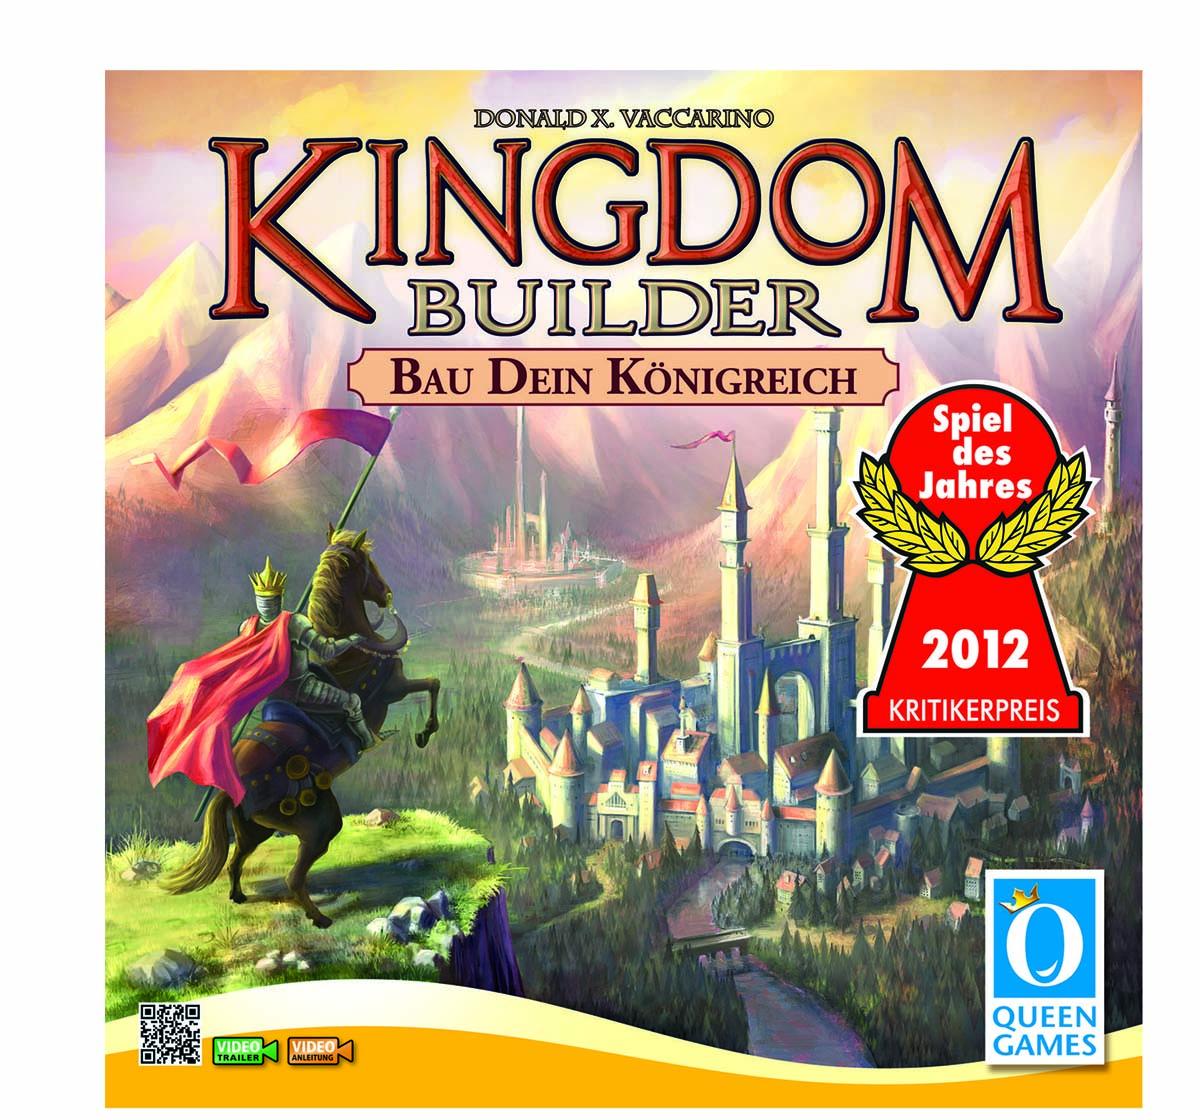 Queen Games   Queen Games Kingdom Builder Board Games for Kids Age 8Y+